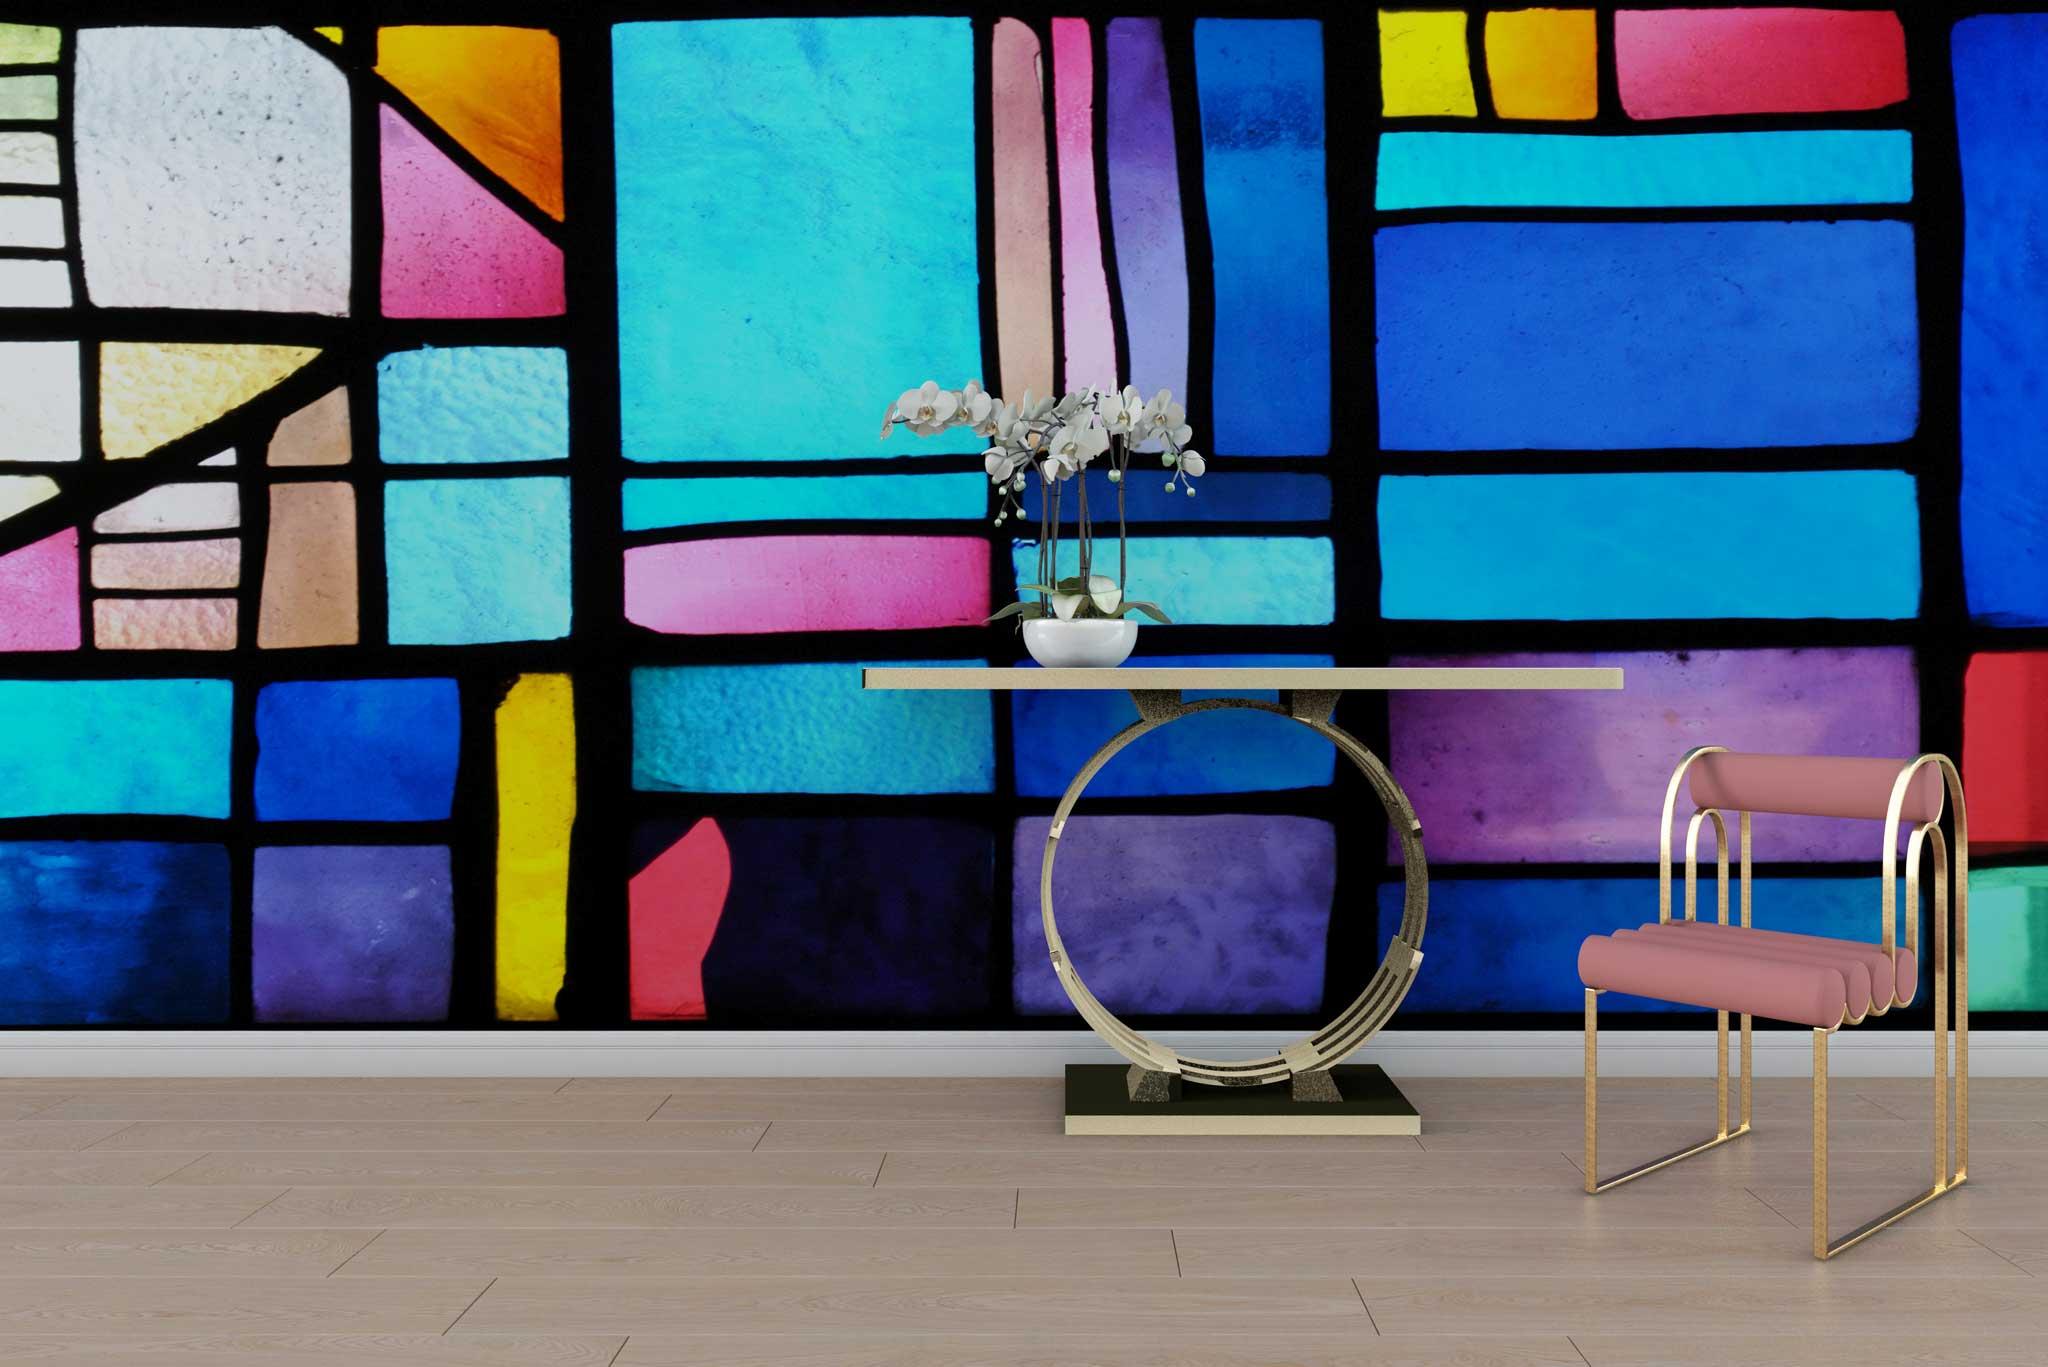 tapet-fototapet-special-personalizat-customizabil-comanda-bucuresti-daring-prints-model-grafic-geometric-contemporan-vitraliu-multicolor